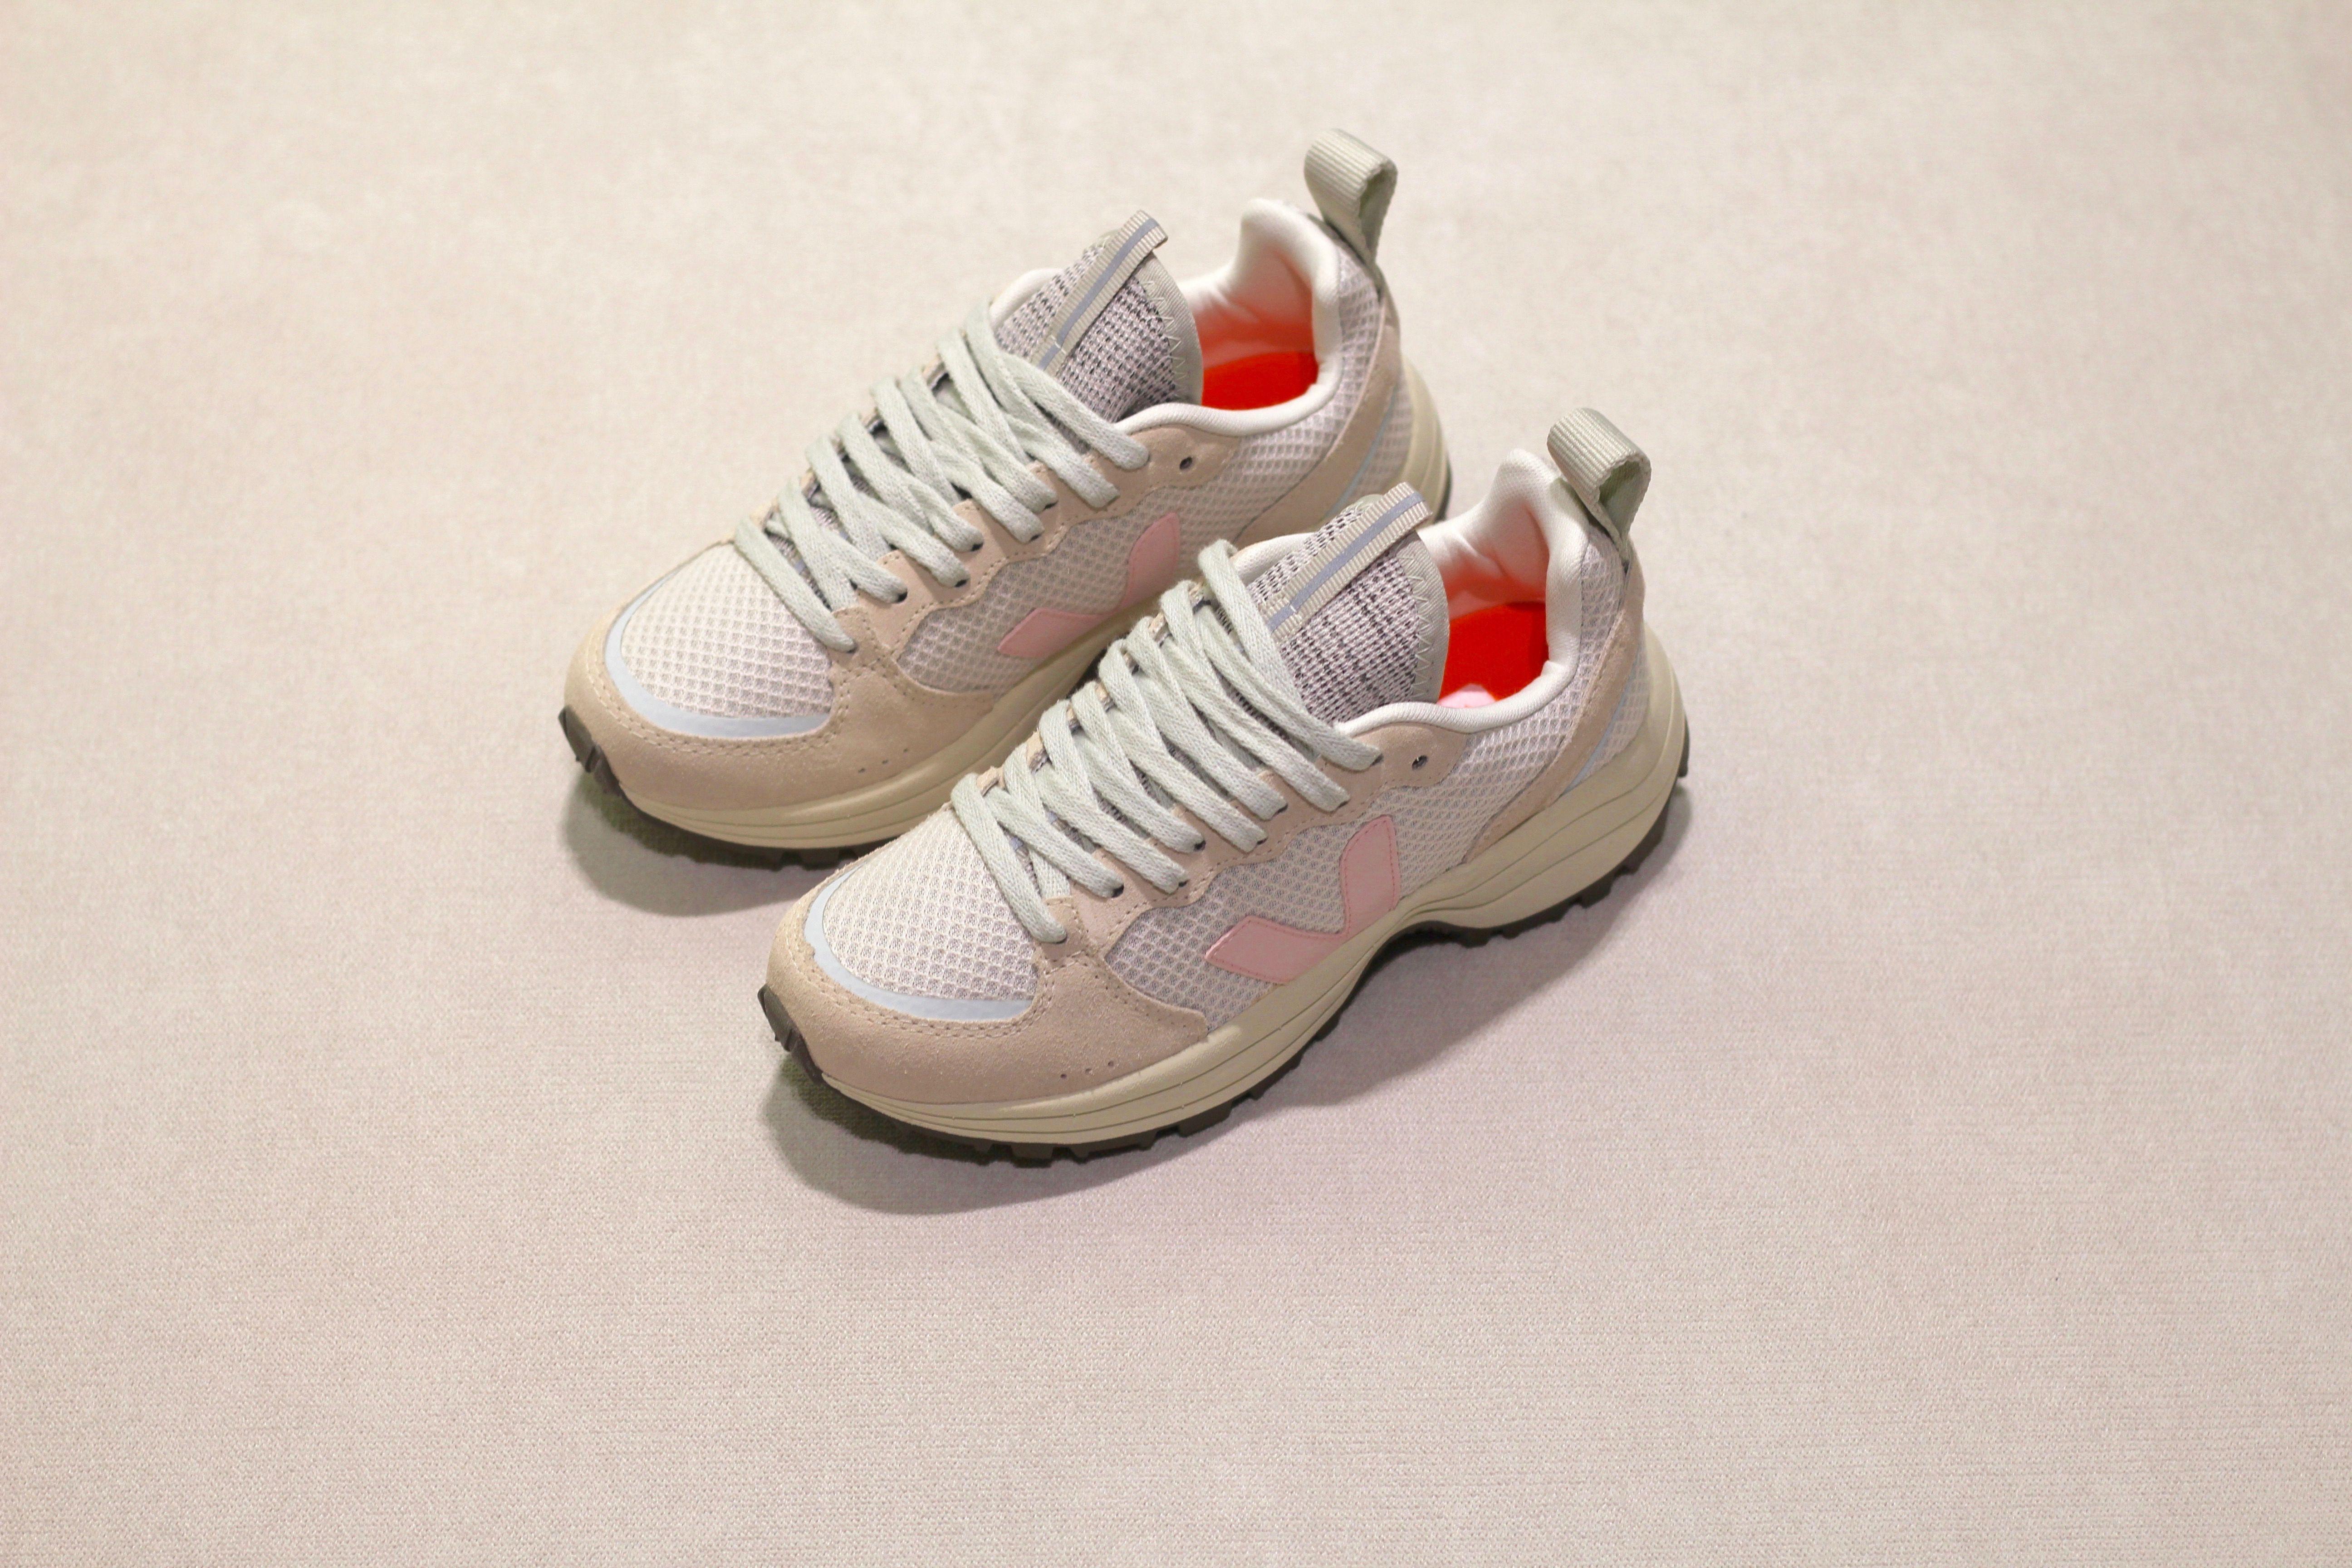 Veja Venturi Hexamesh Gravel Petale Chaussures Air Max Talons